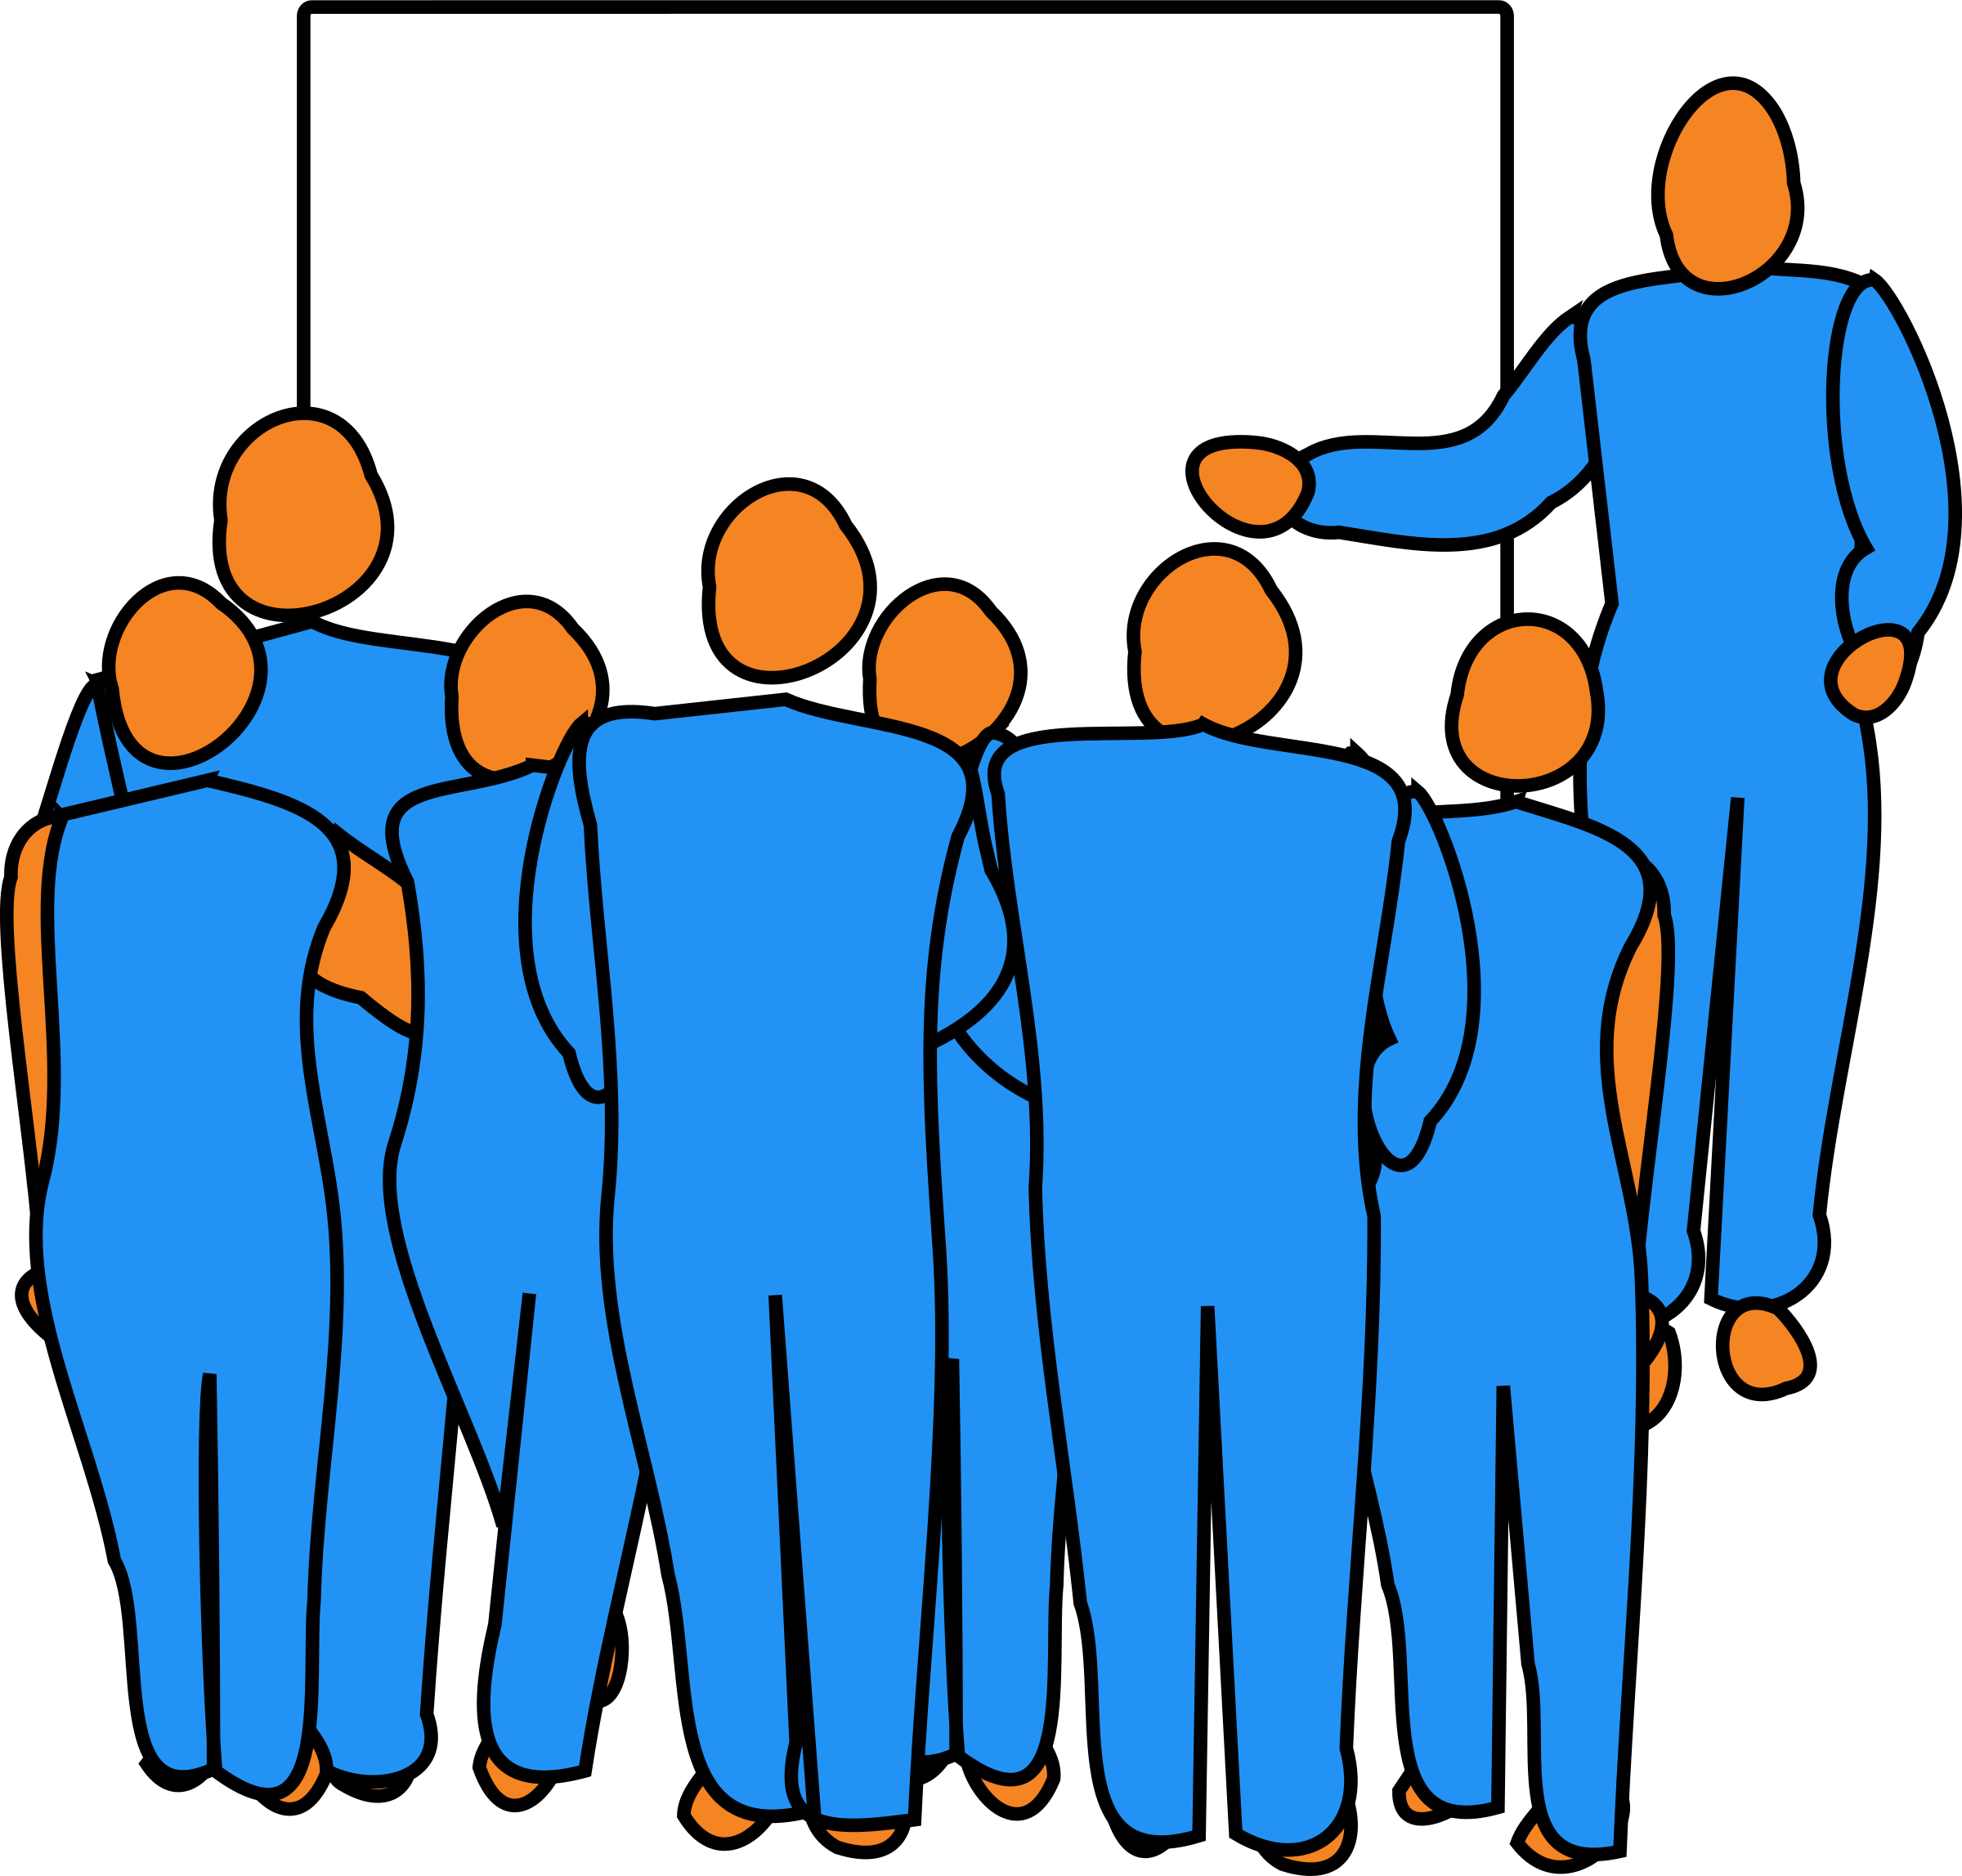 Presentation by bitterjug